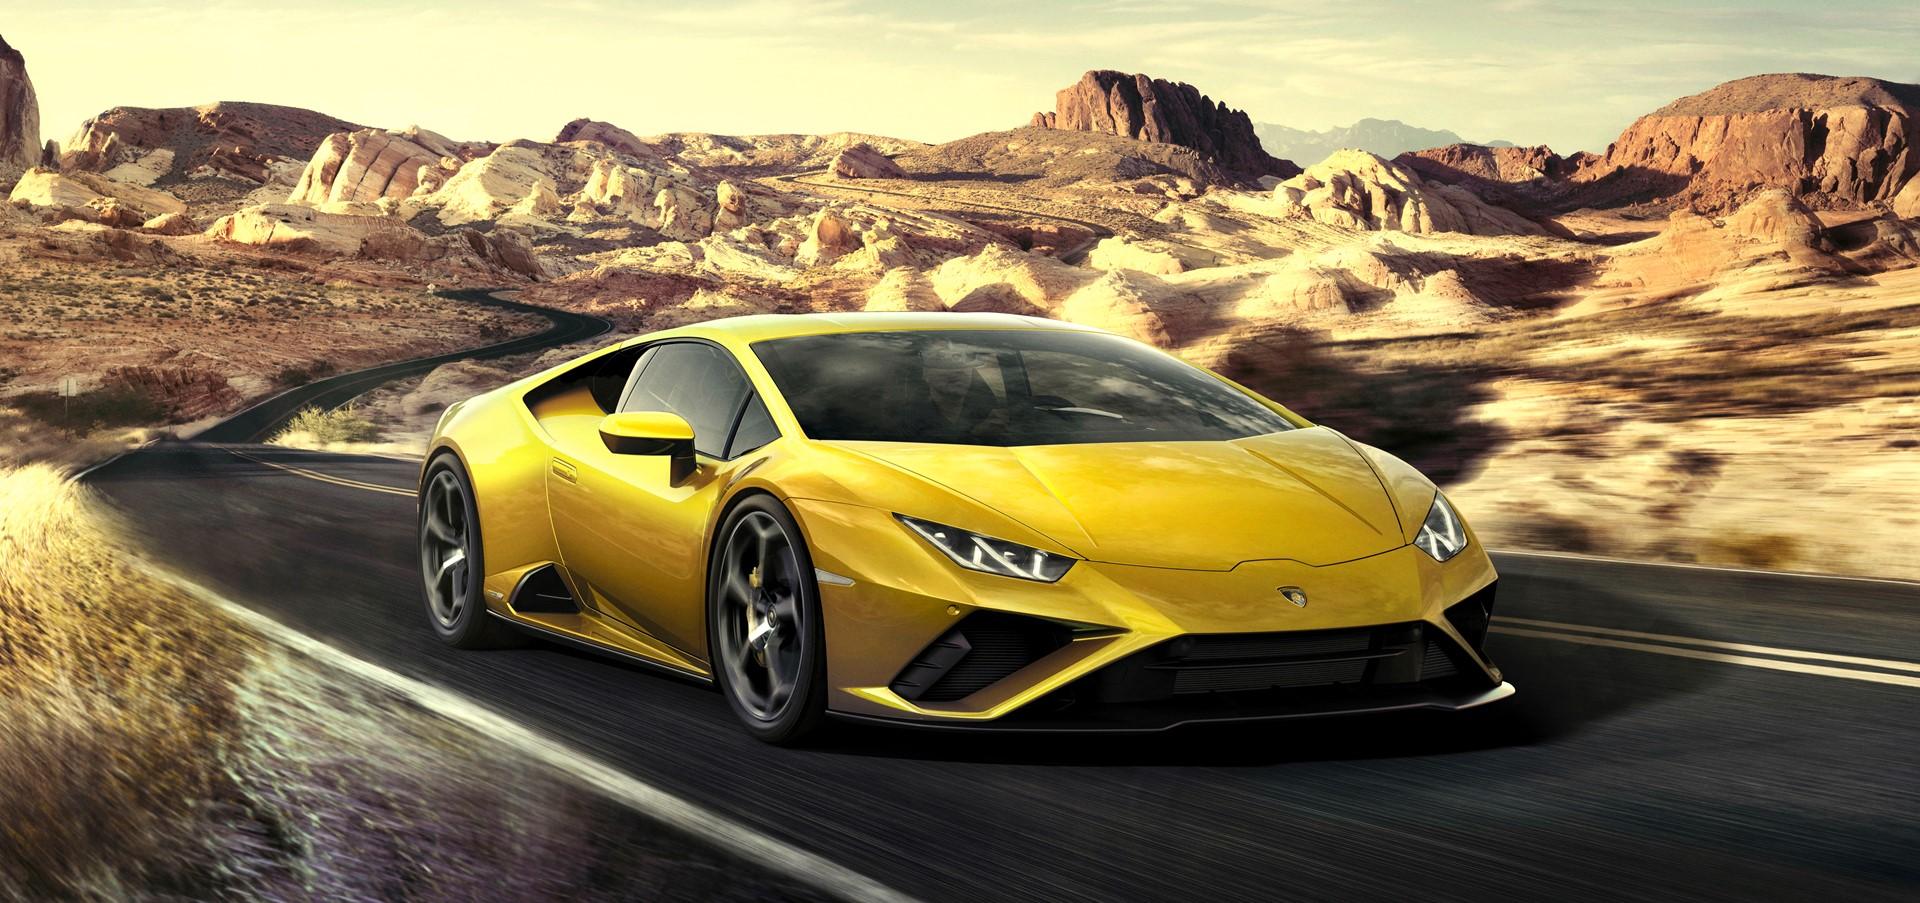 Neuer Lamborghini Huracán EVO RWD: Volle Kontrolle bei..